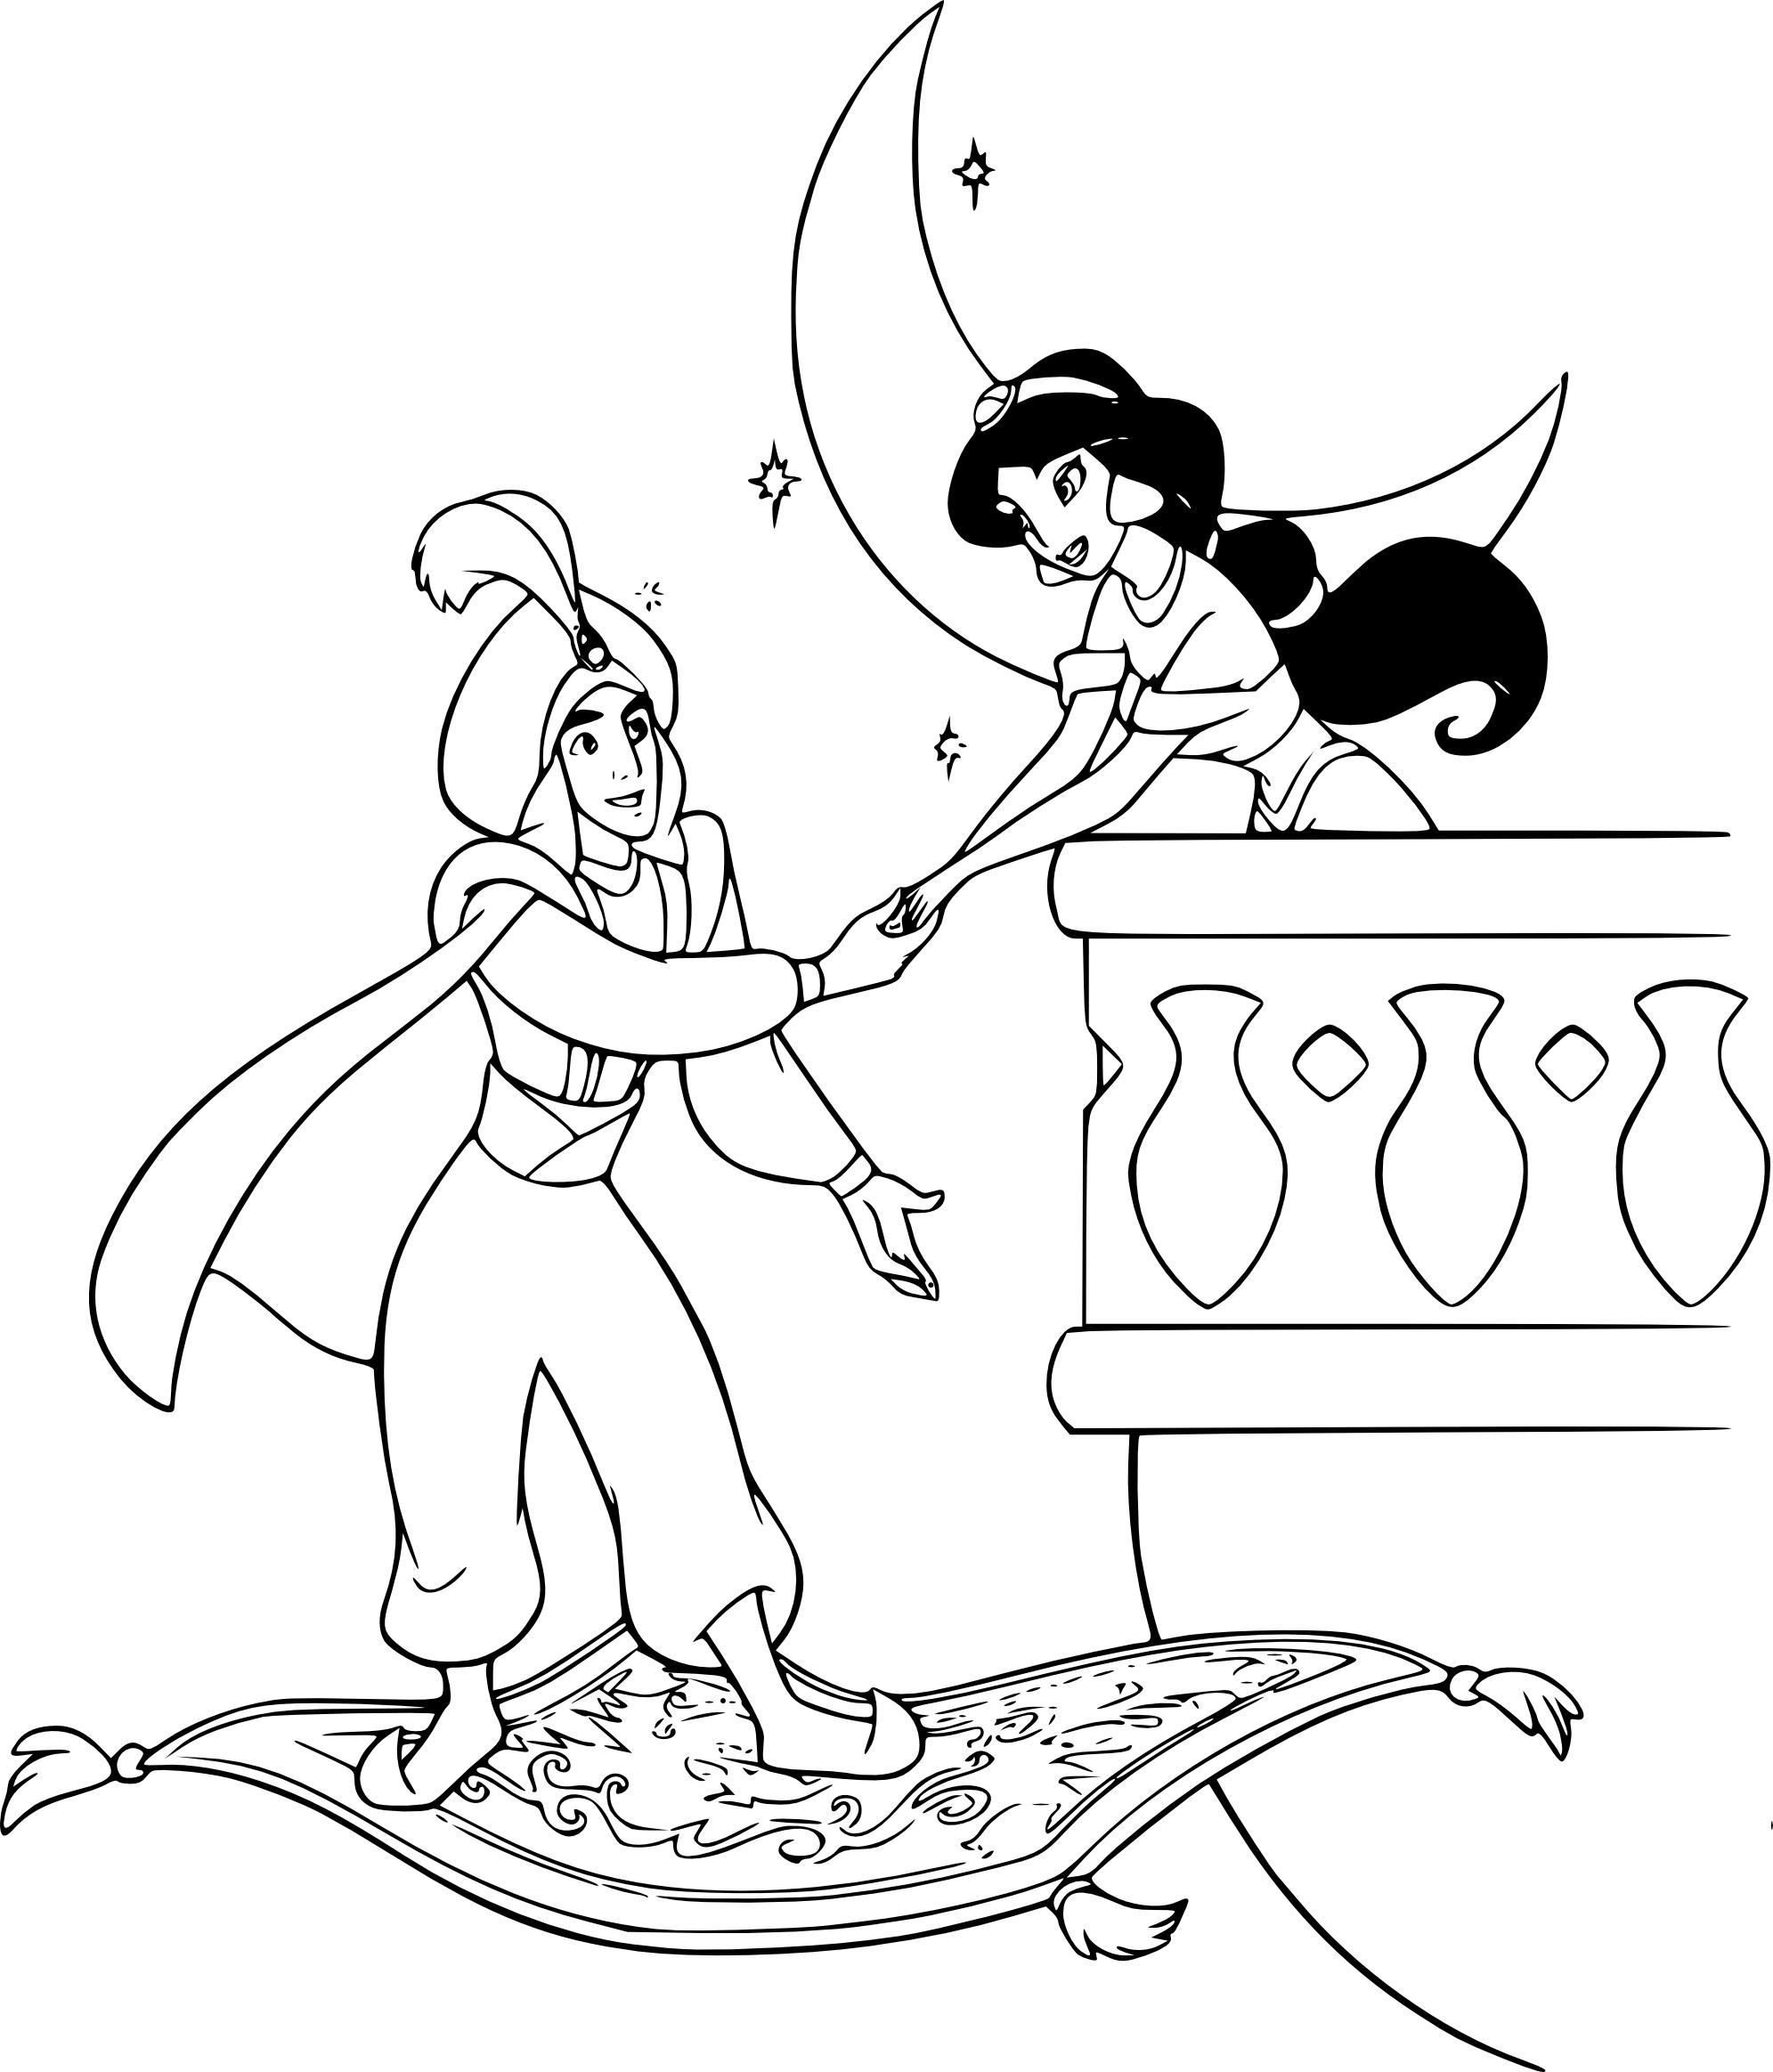 Coloriage aladdin et son tapis volant avec jasmine imprimer - Coloriage de jasmine ...